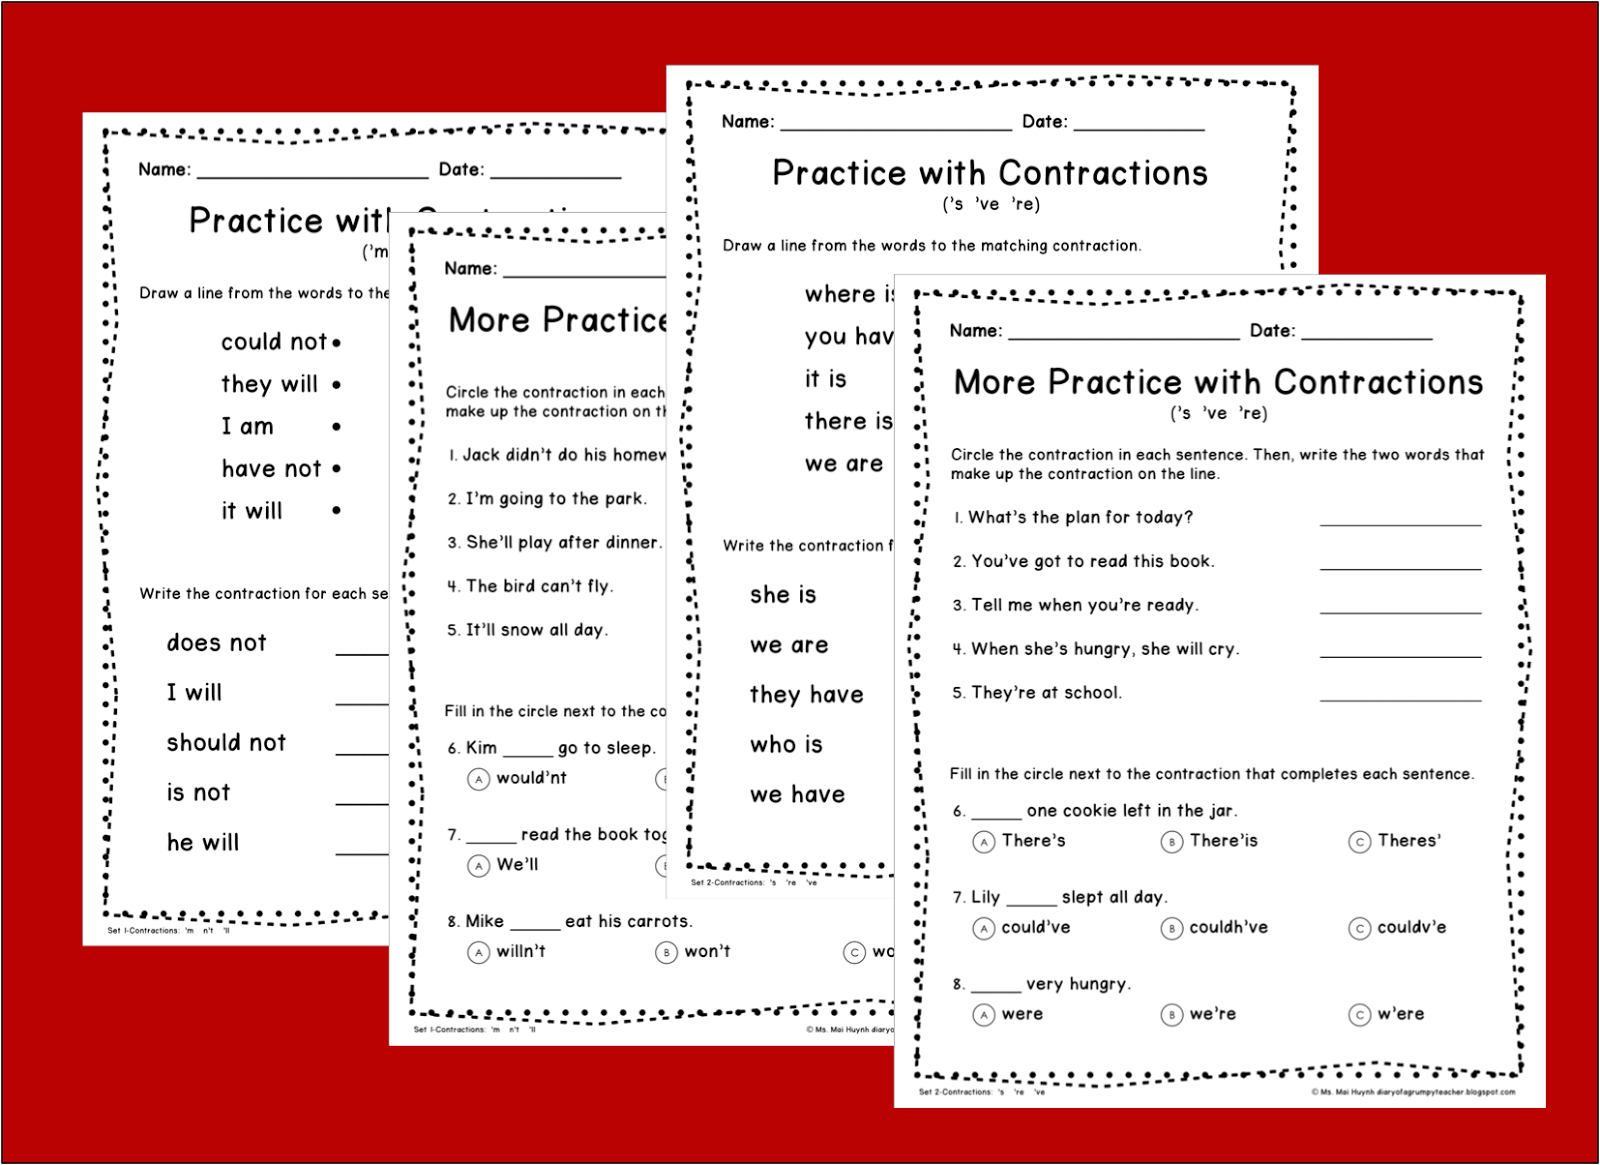 Not Contraction Worksheet   Printable Worksheets and Activities for  Teachers [ 1165 x 1600 Pixel ]